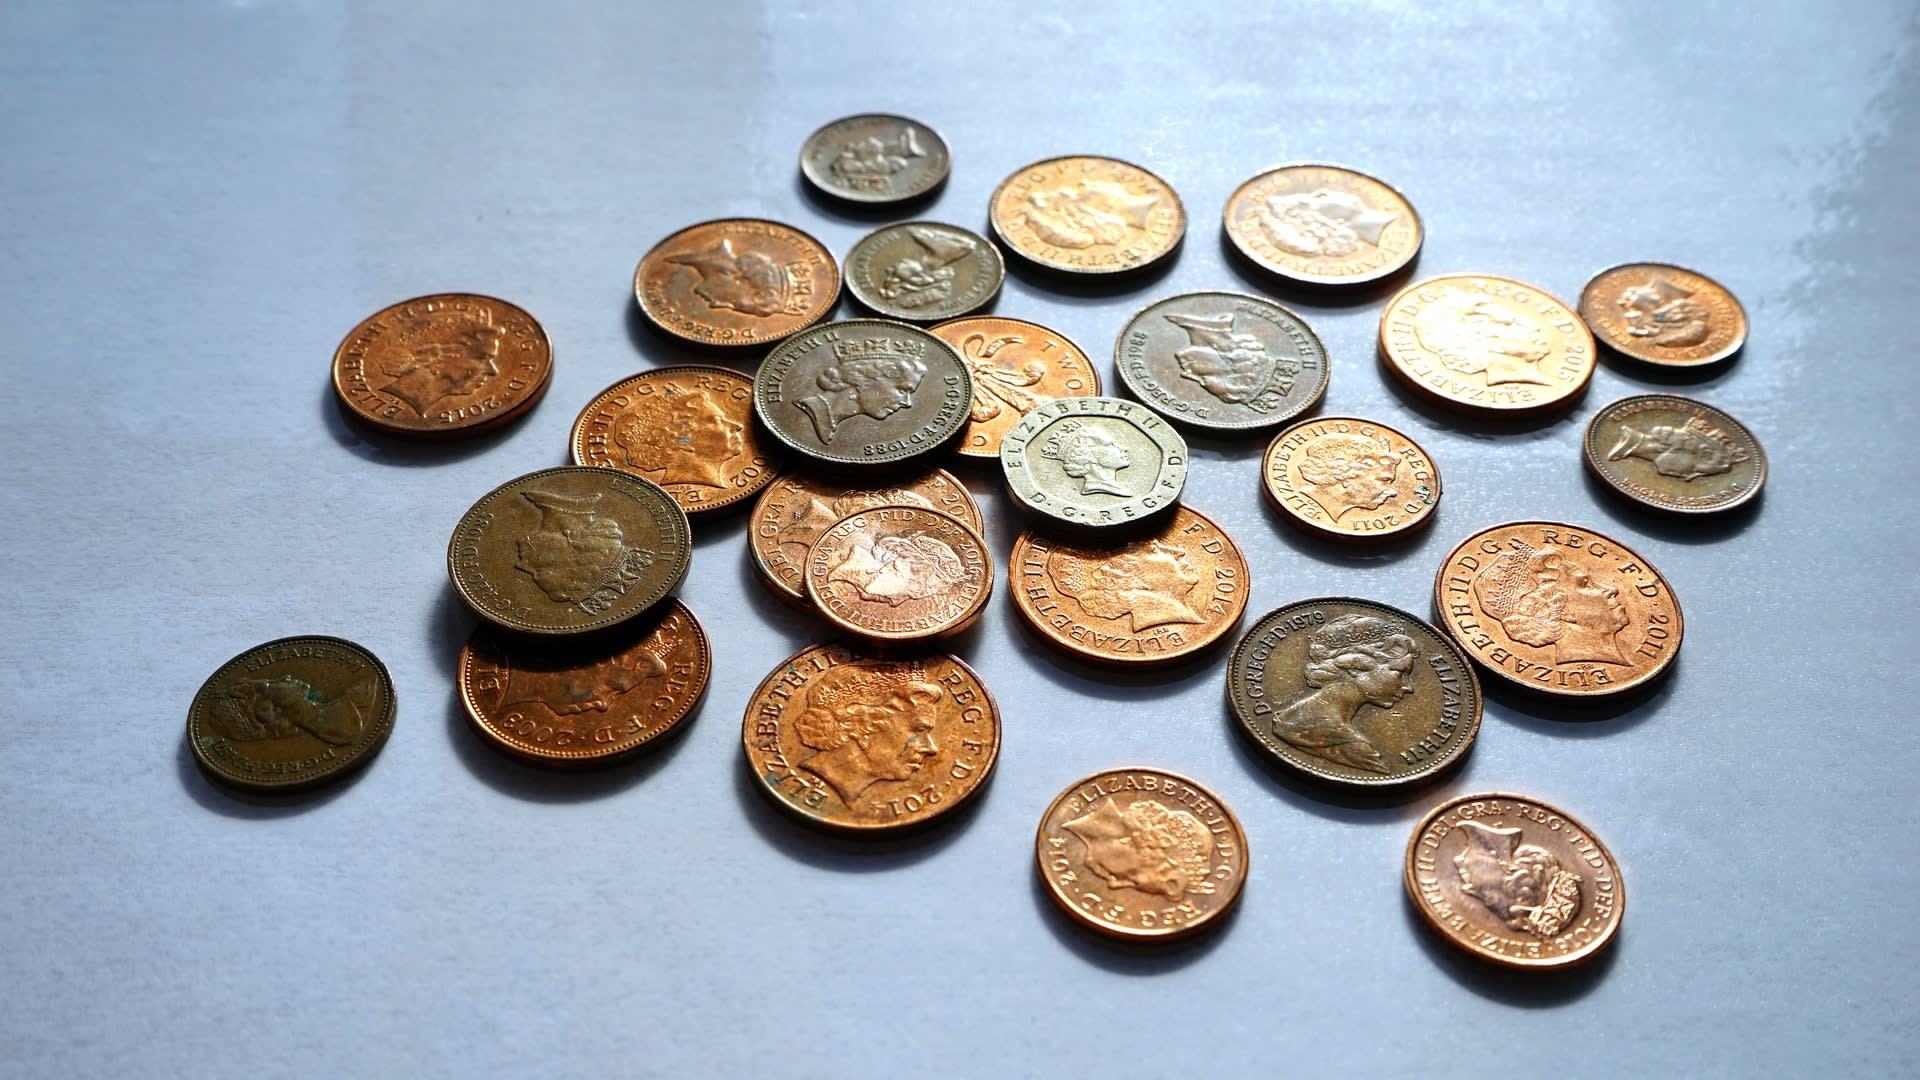 Cash concerns over Junior Isa savers